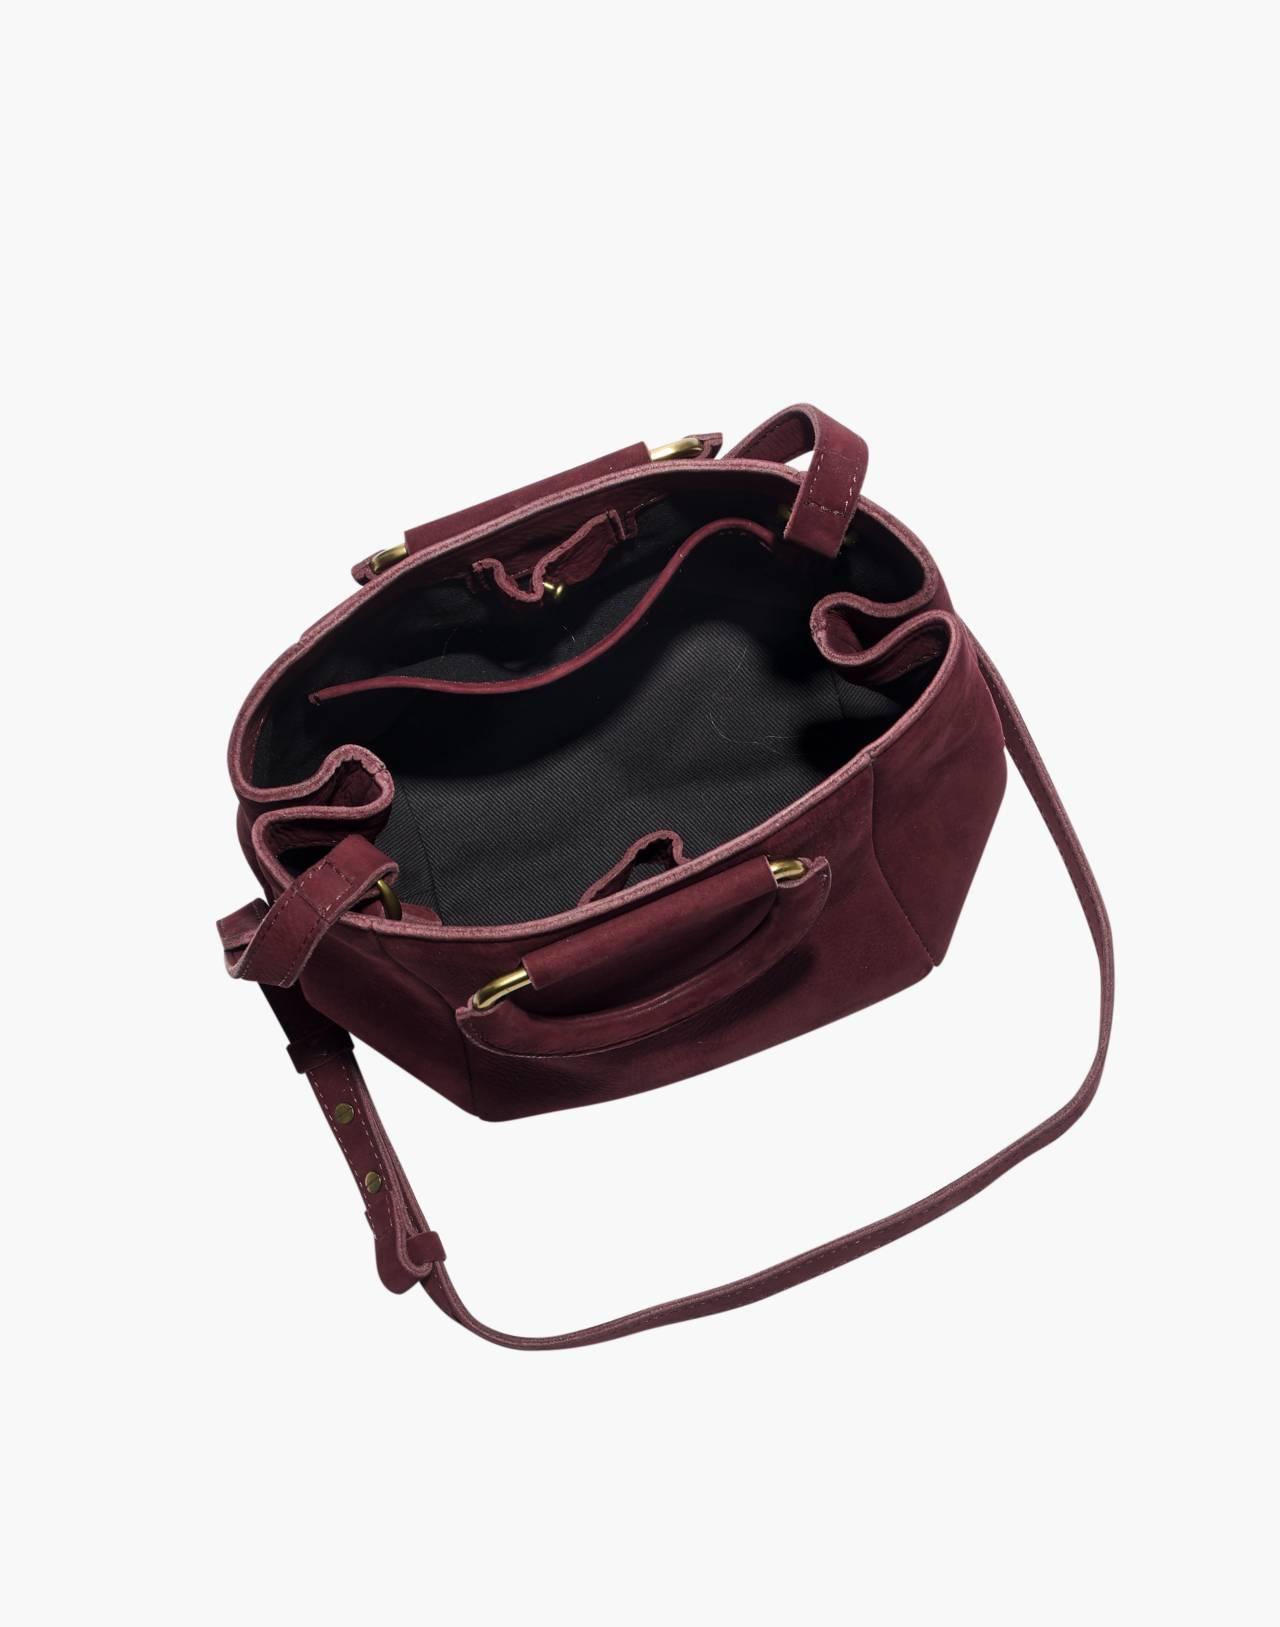 The Top-Handle Mini Bag in dark cabernet image 2